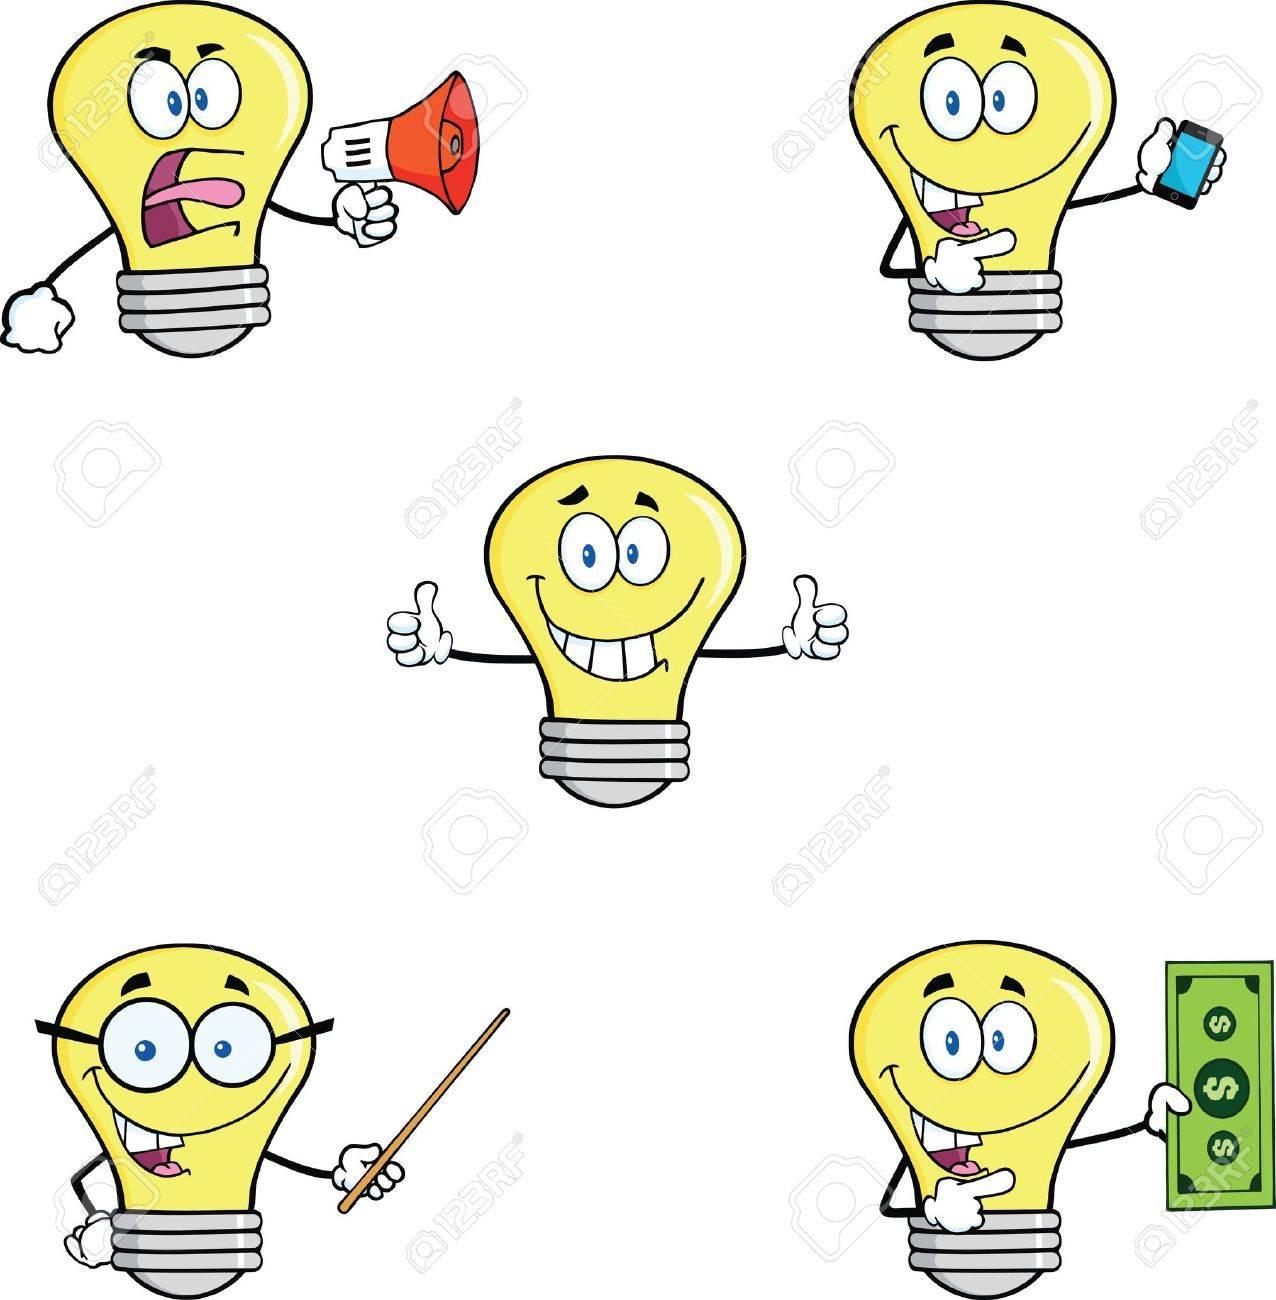 Yellow Light Bulb Cartoon Characters  Set Stock Vector - 21491885